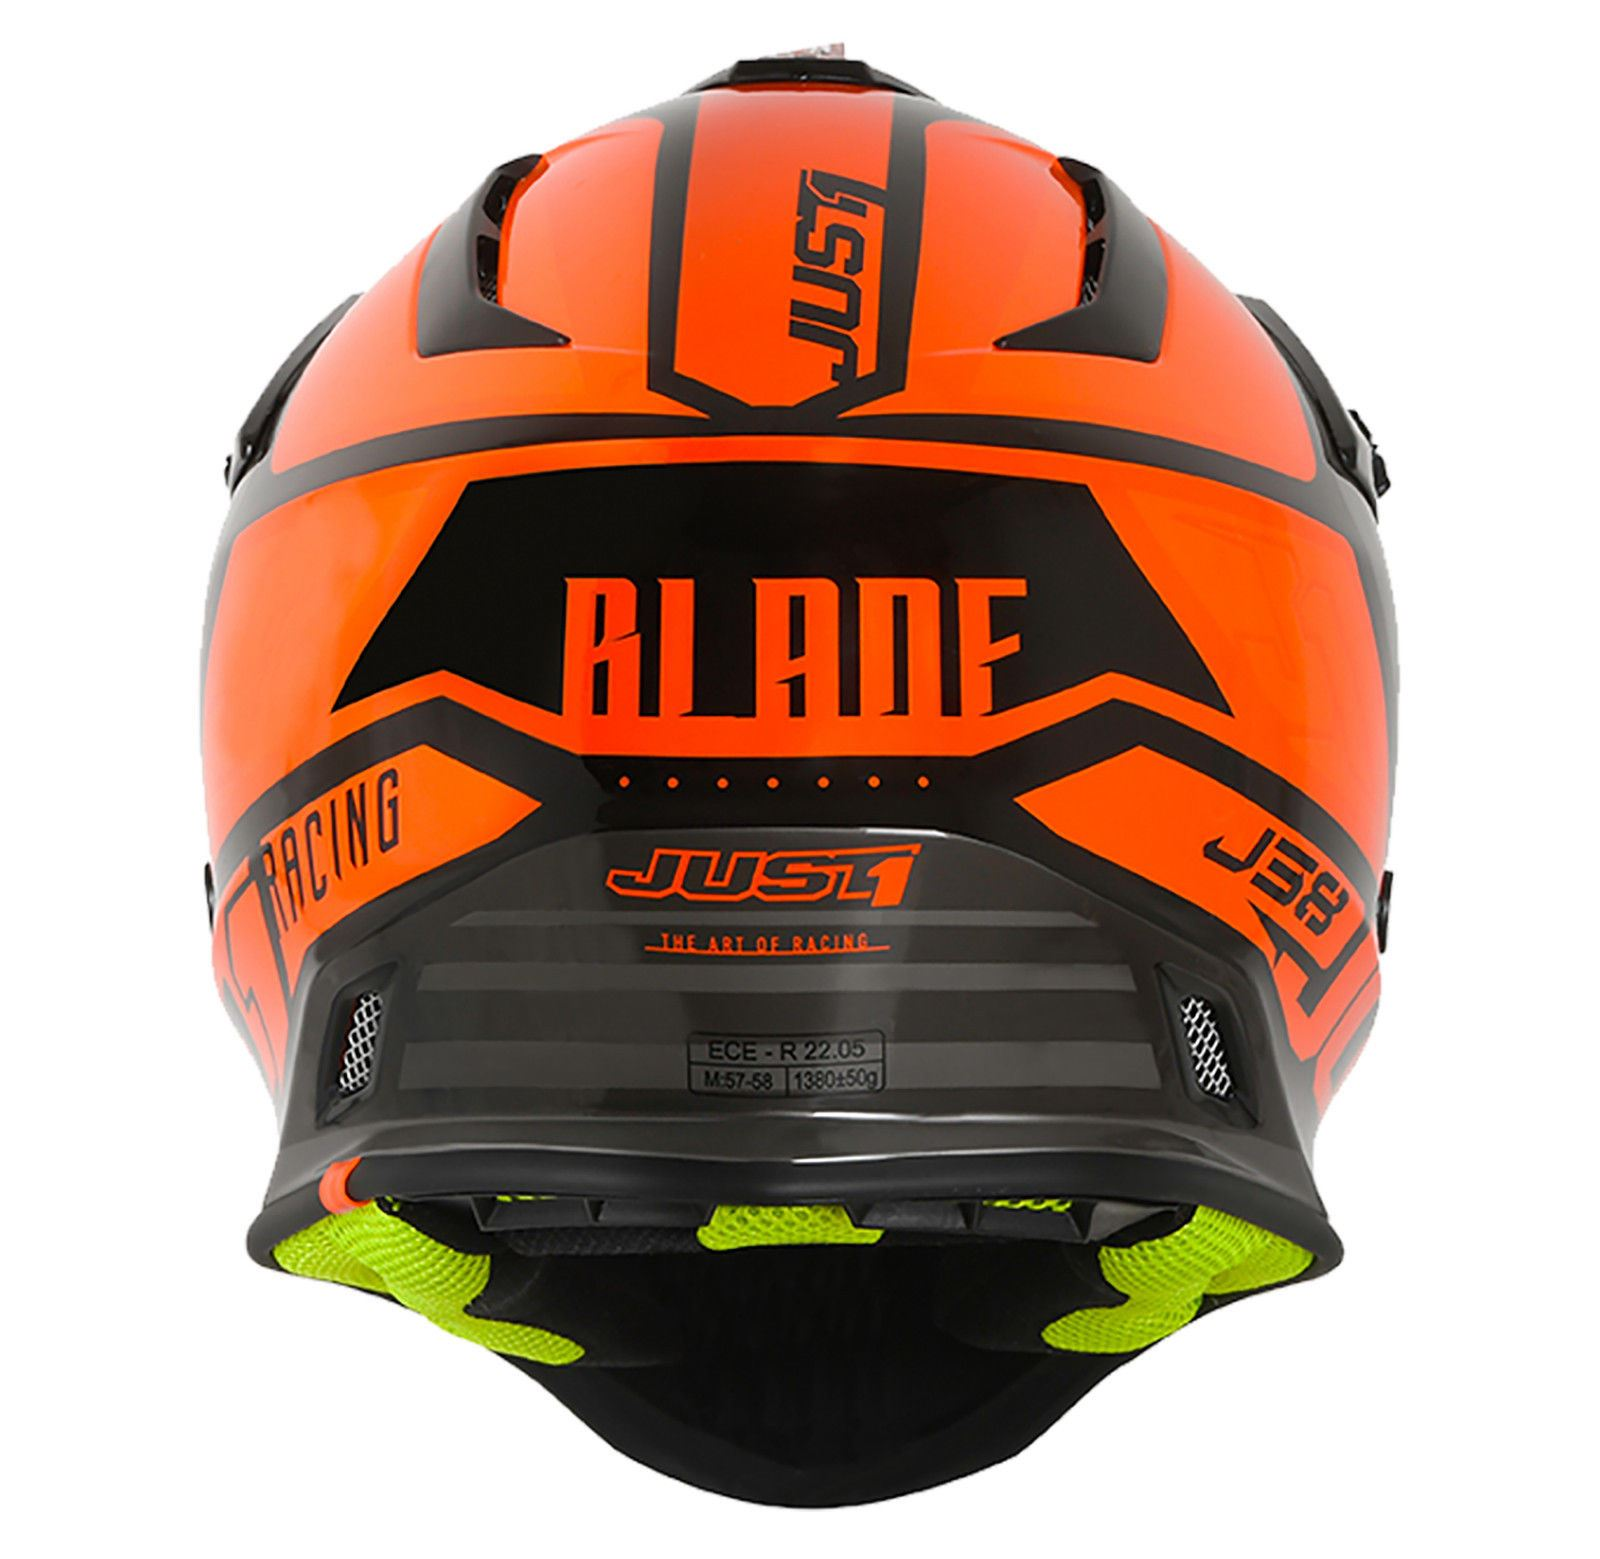 Just1-J38-Blade-Helmet-Motocross-Enduro-MX-ATV-Motorcycle-Off-Road-Full-Face-ACU thumbnail 34